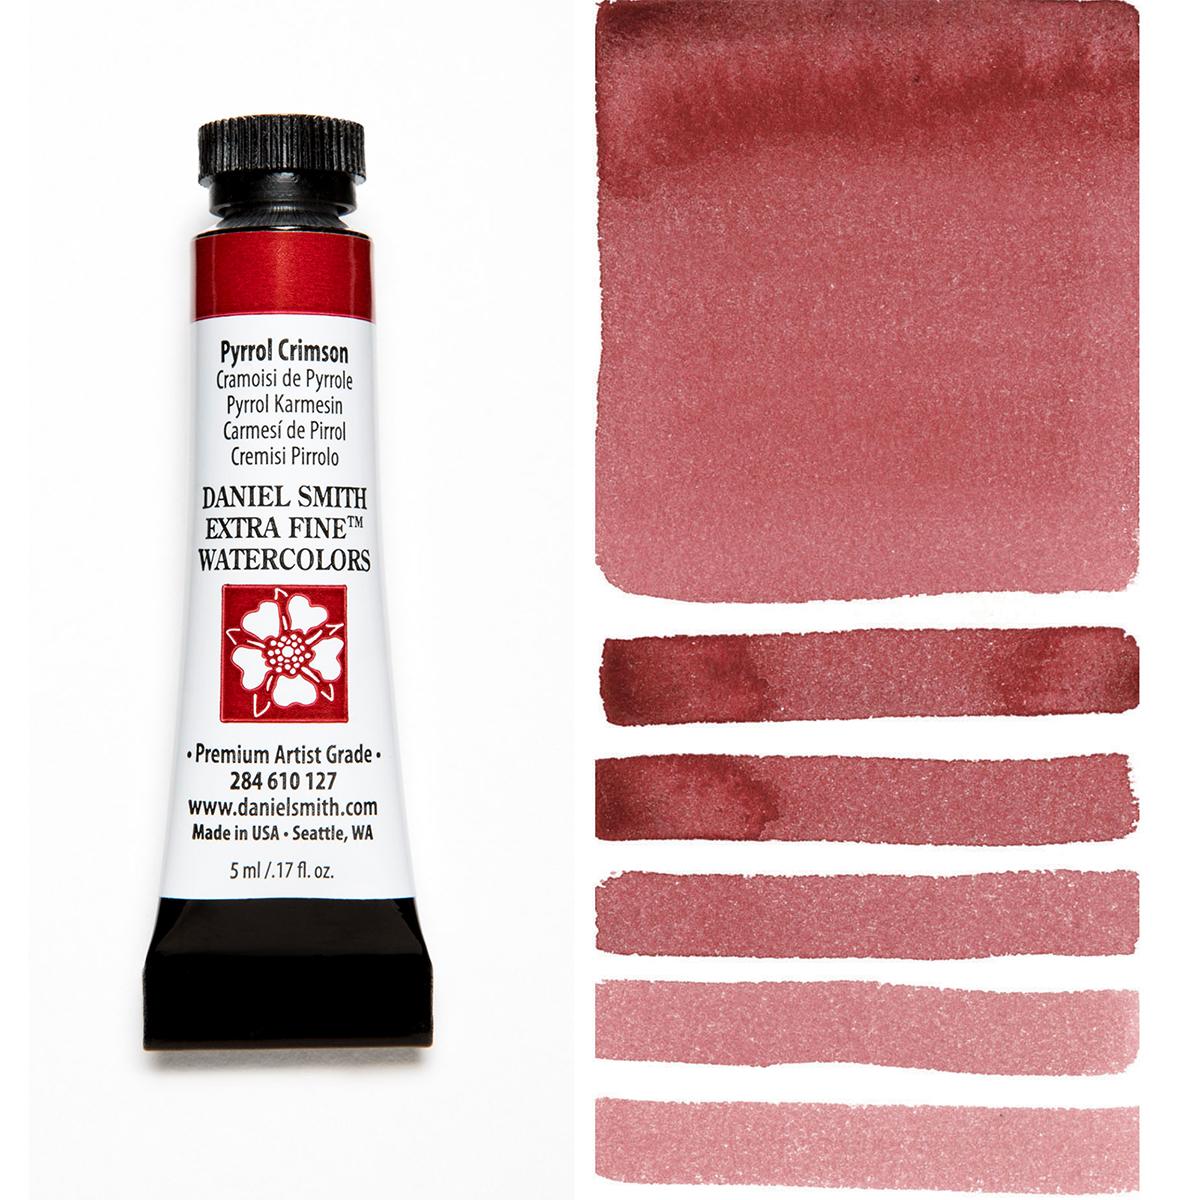 DANIEL SMITH ピロールクリムソン Pyrrol Crimson スミス 今季も再入荷 水彩絵具 ダニエル 販売 5mlチューブ